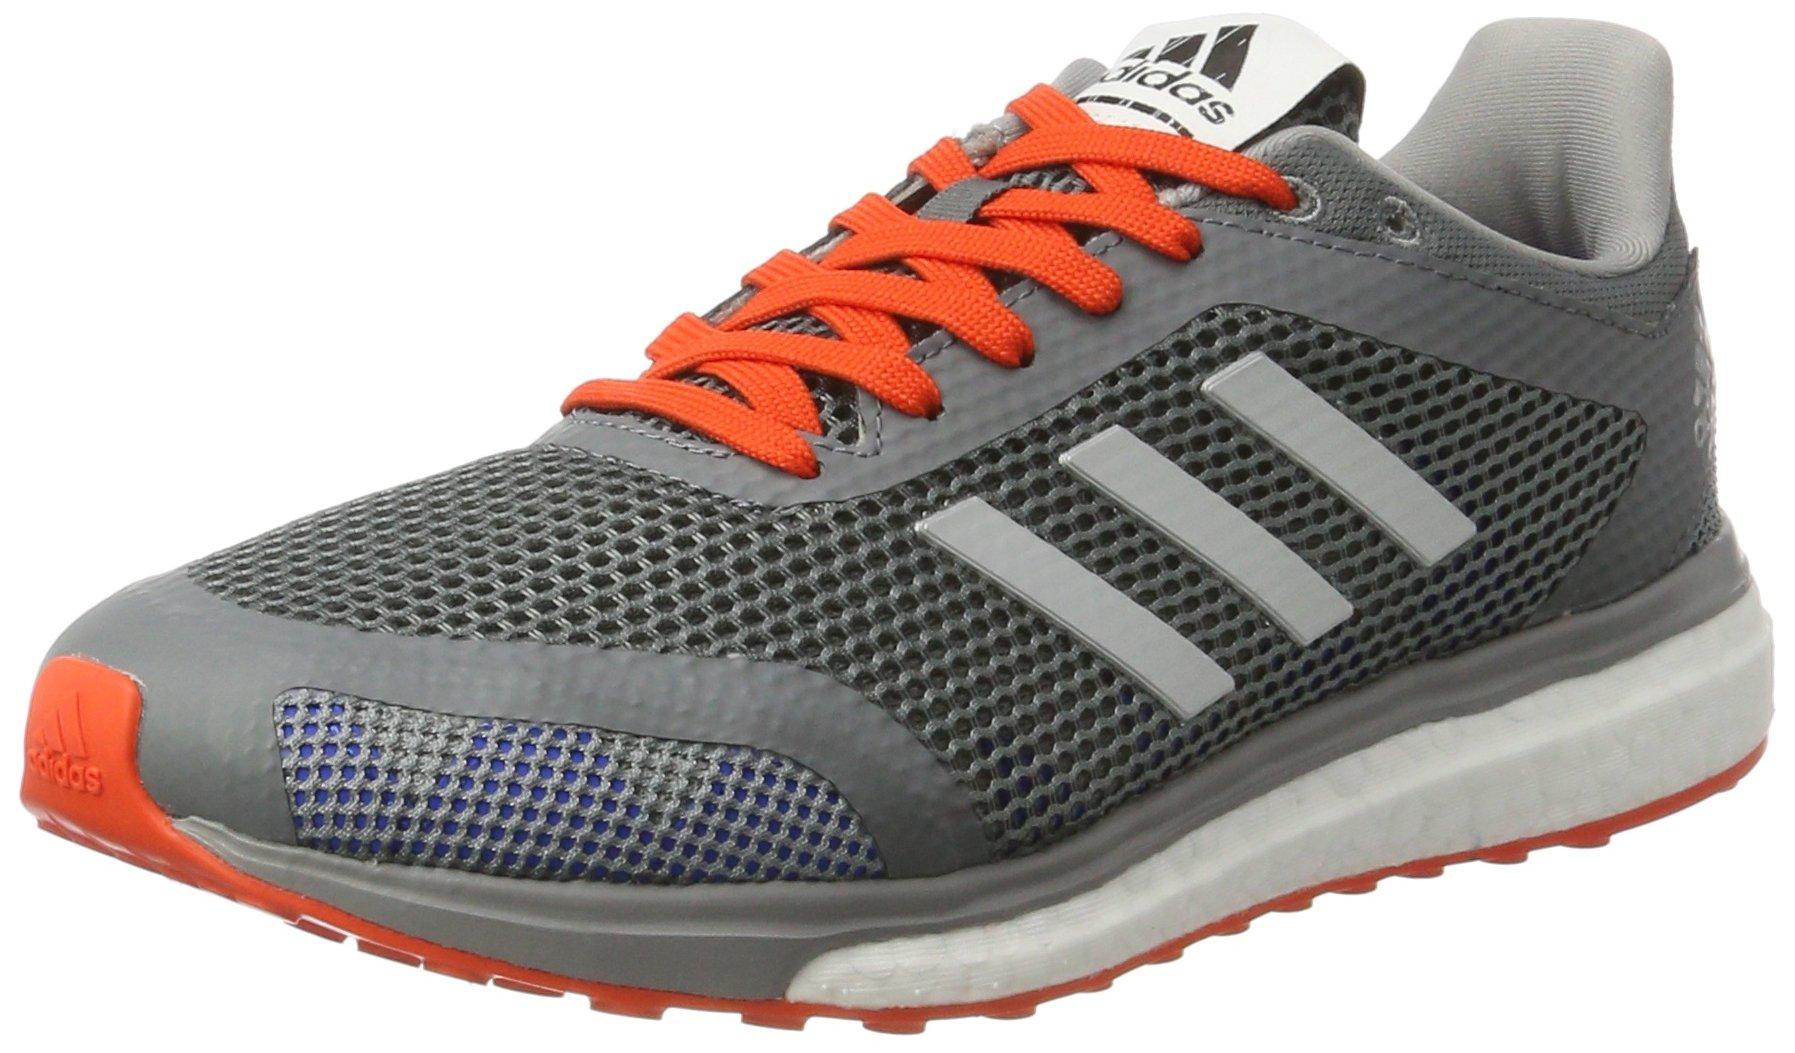 plamet Tennis De Adidas Eu energi40 Homme Grisgrivis 3 2 ResponseMChaussures BeCdxo